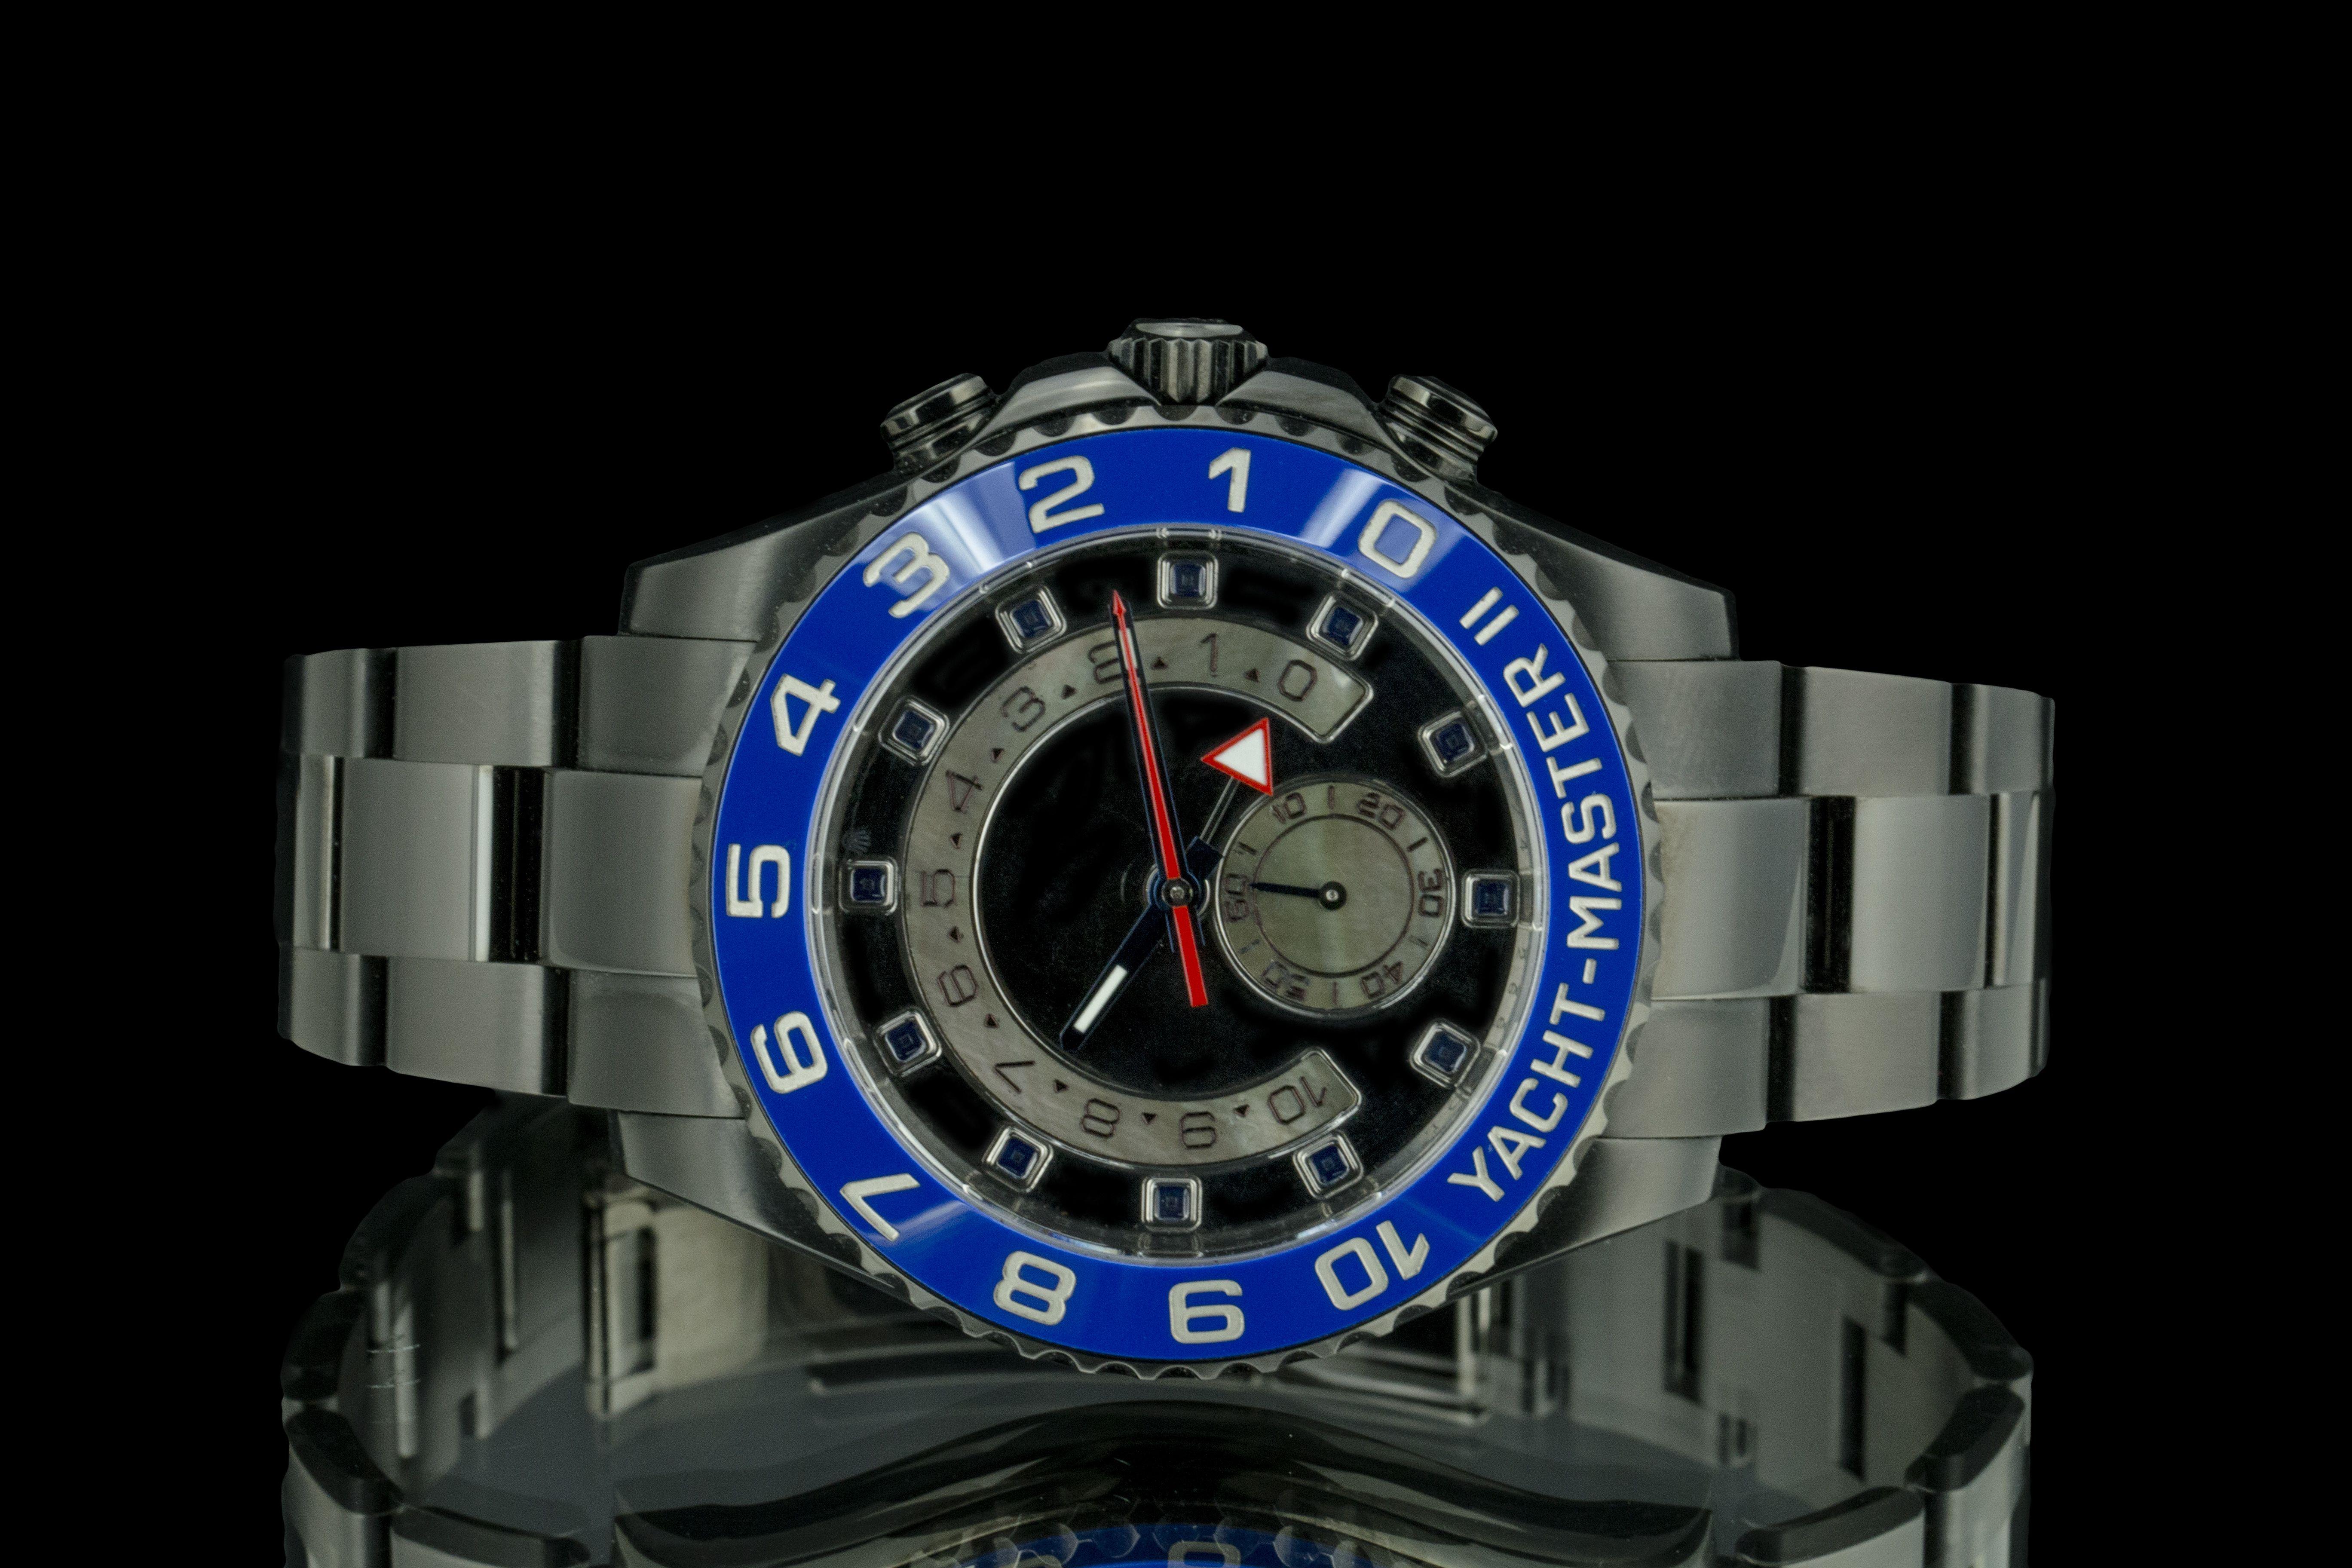 Rolex Yacht Master Ll Pvd Black Dial Blue Bezel Rolex Rolex Yacht Master Rolex Watches Women